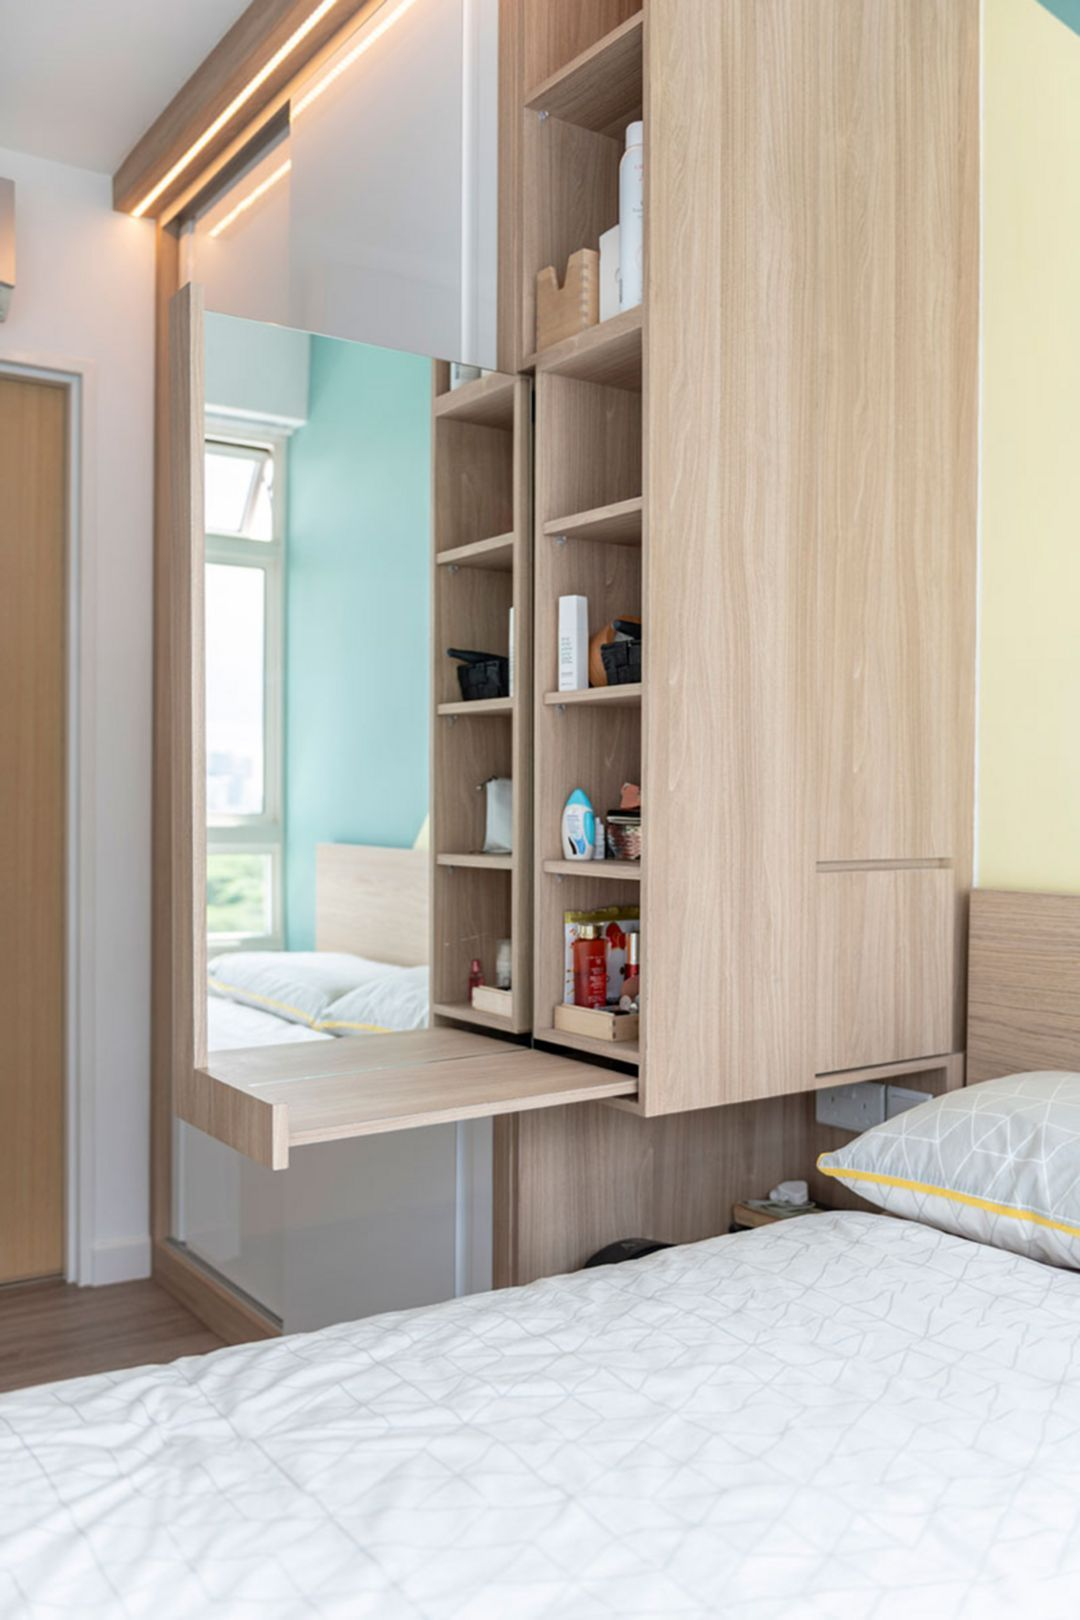 Small bedroom with wardrobe